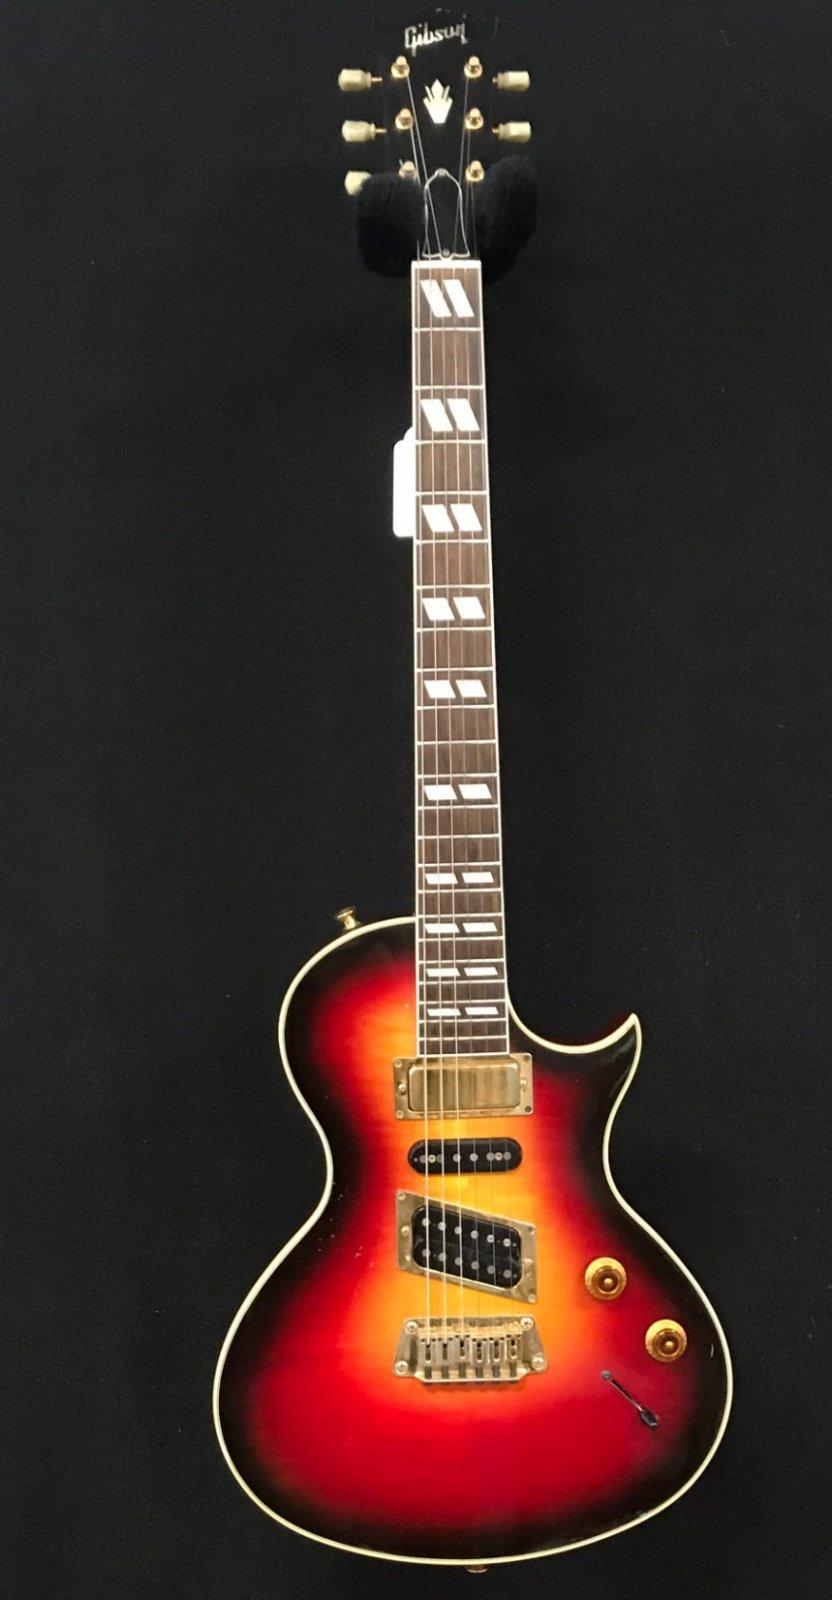 Used 1996 Gibson Nighthawk standard ST-3